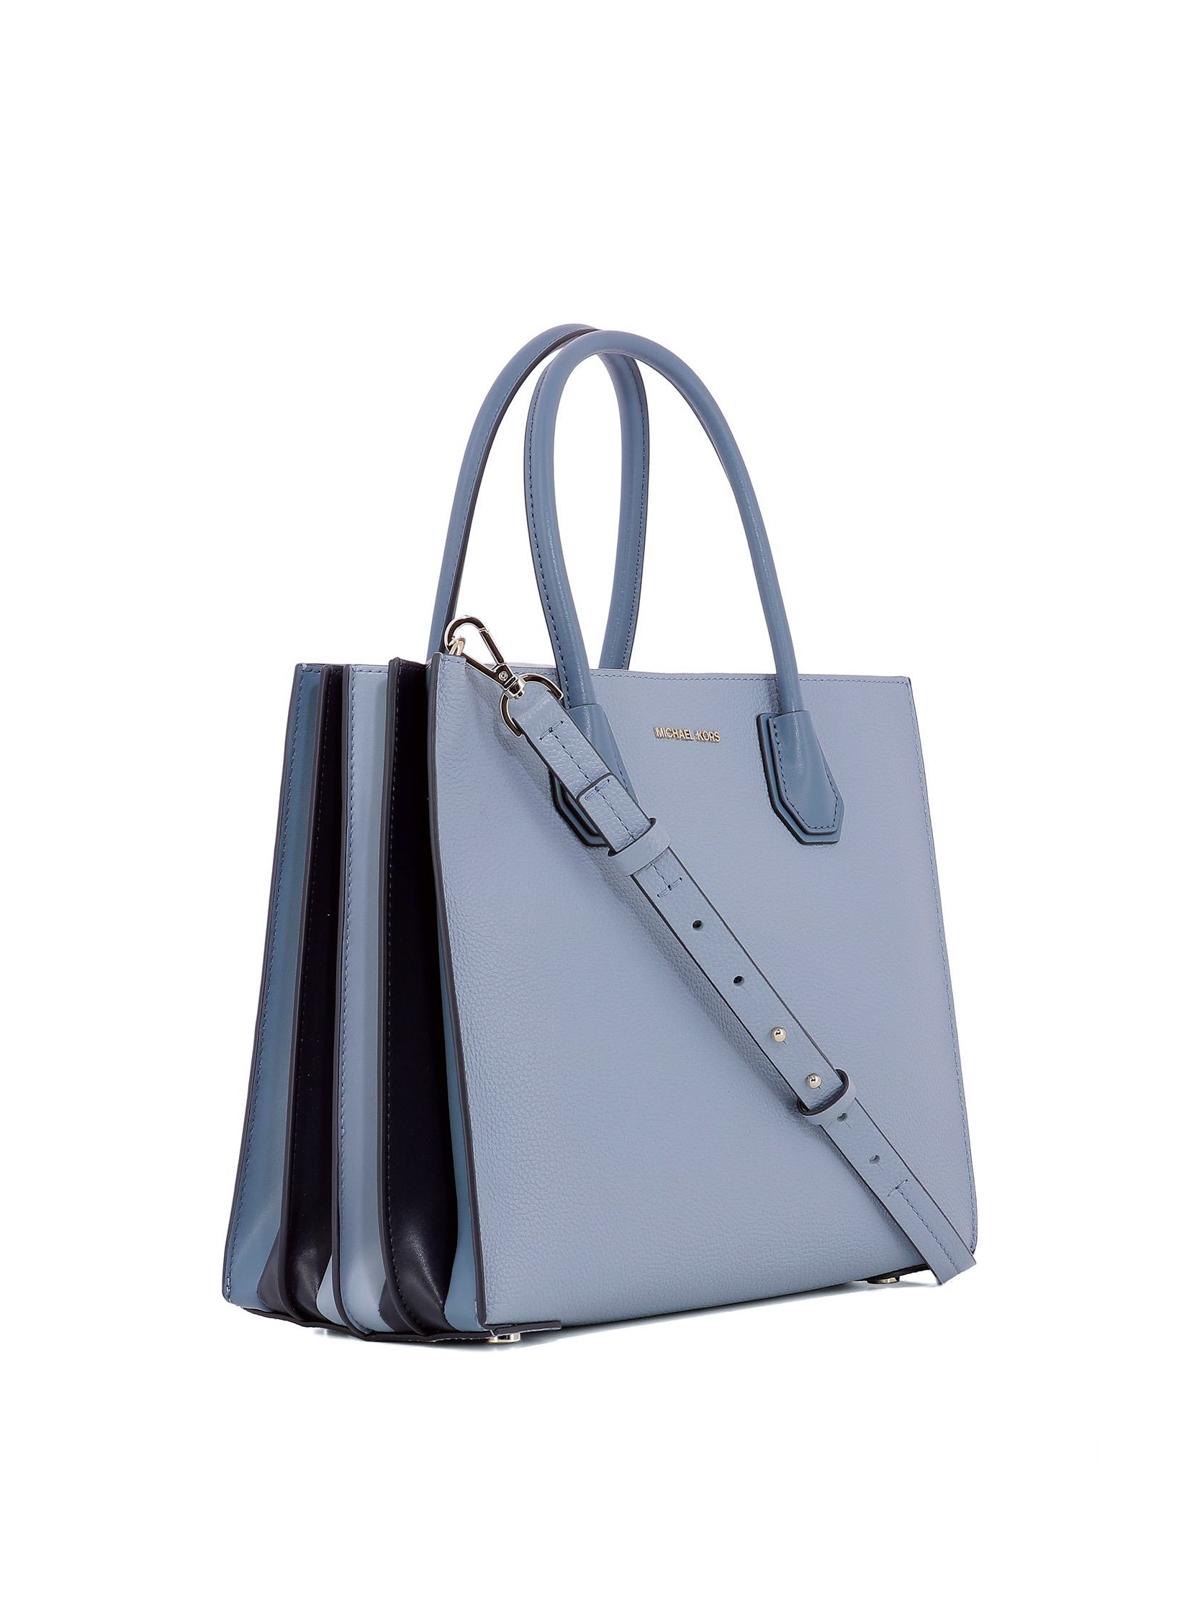 8555957d3c80a MICHAEL KORS  totes bags online - Mercer large light blue accordion tote